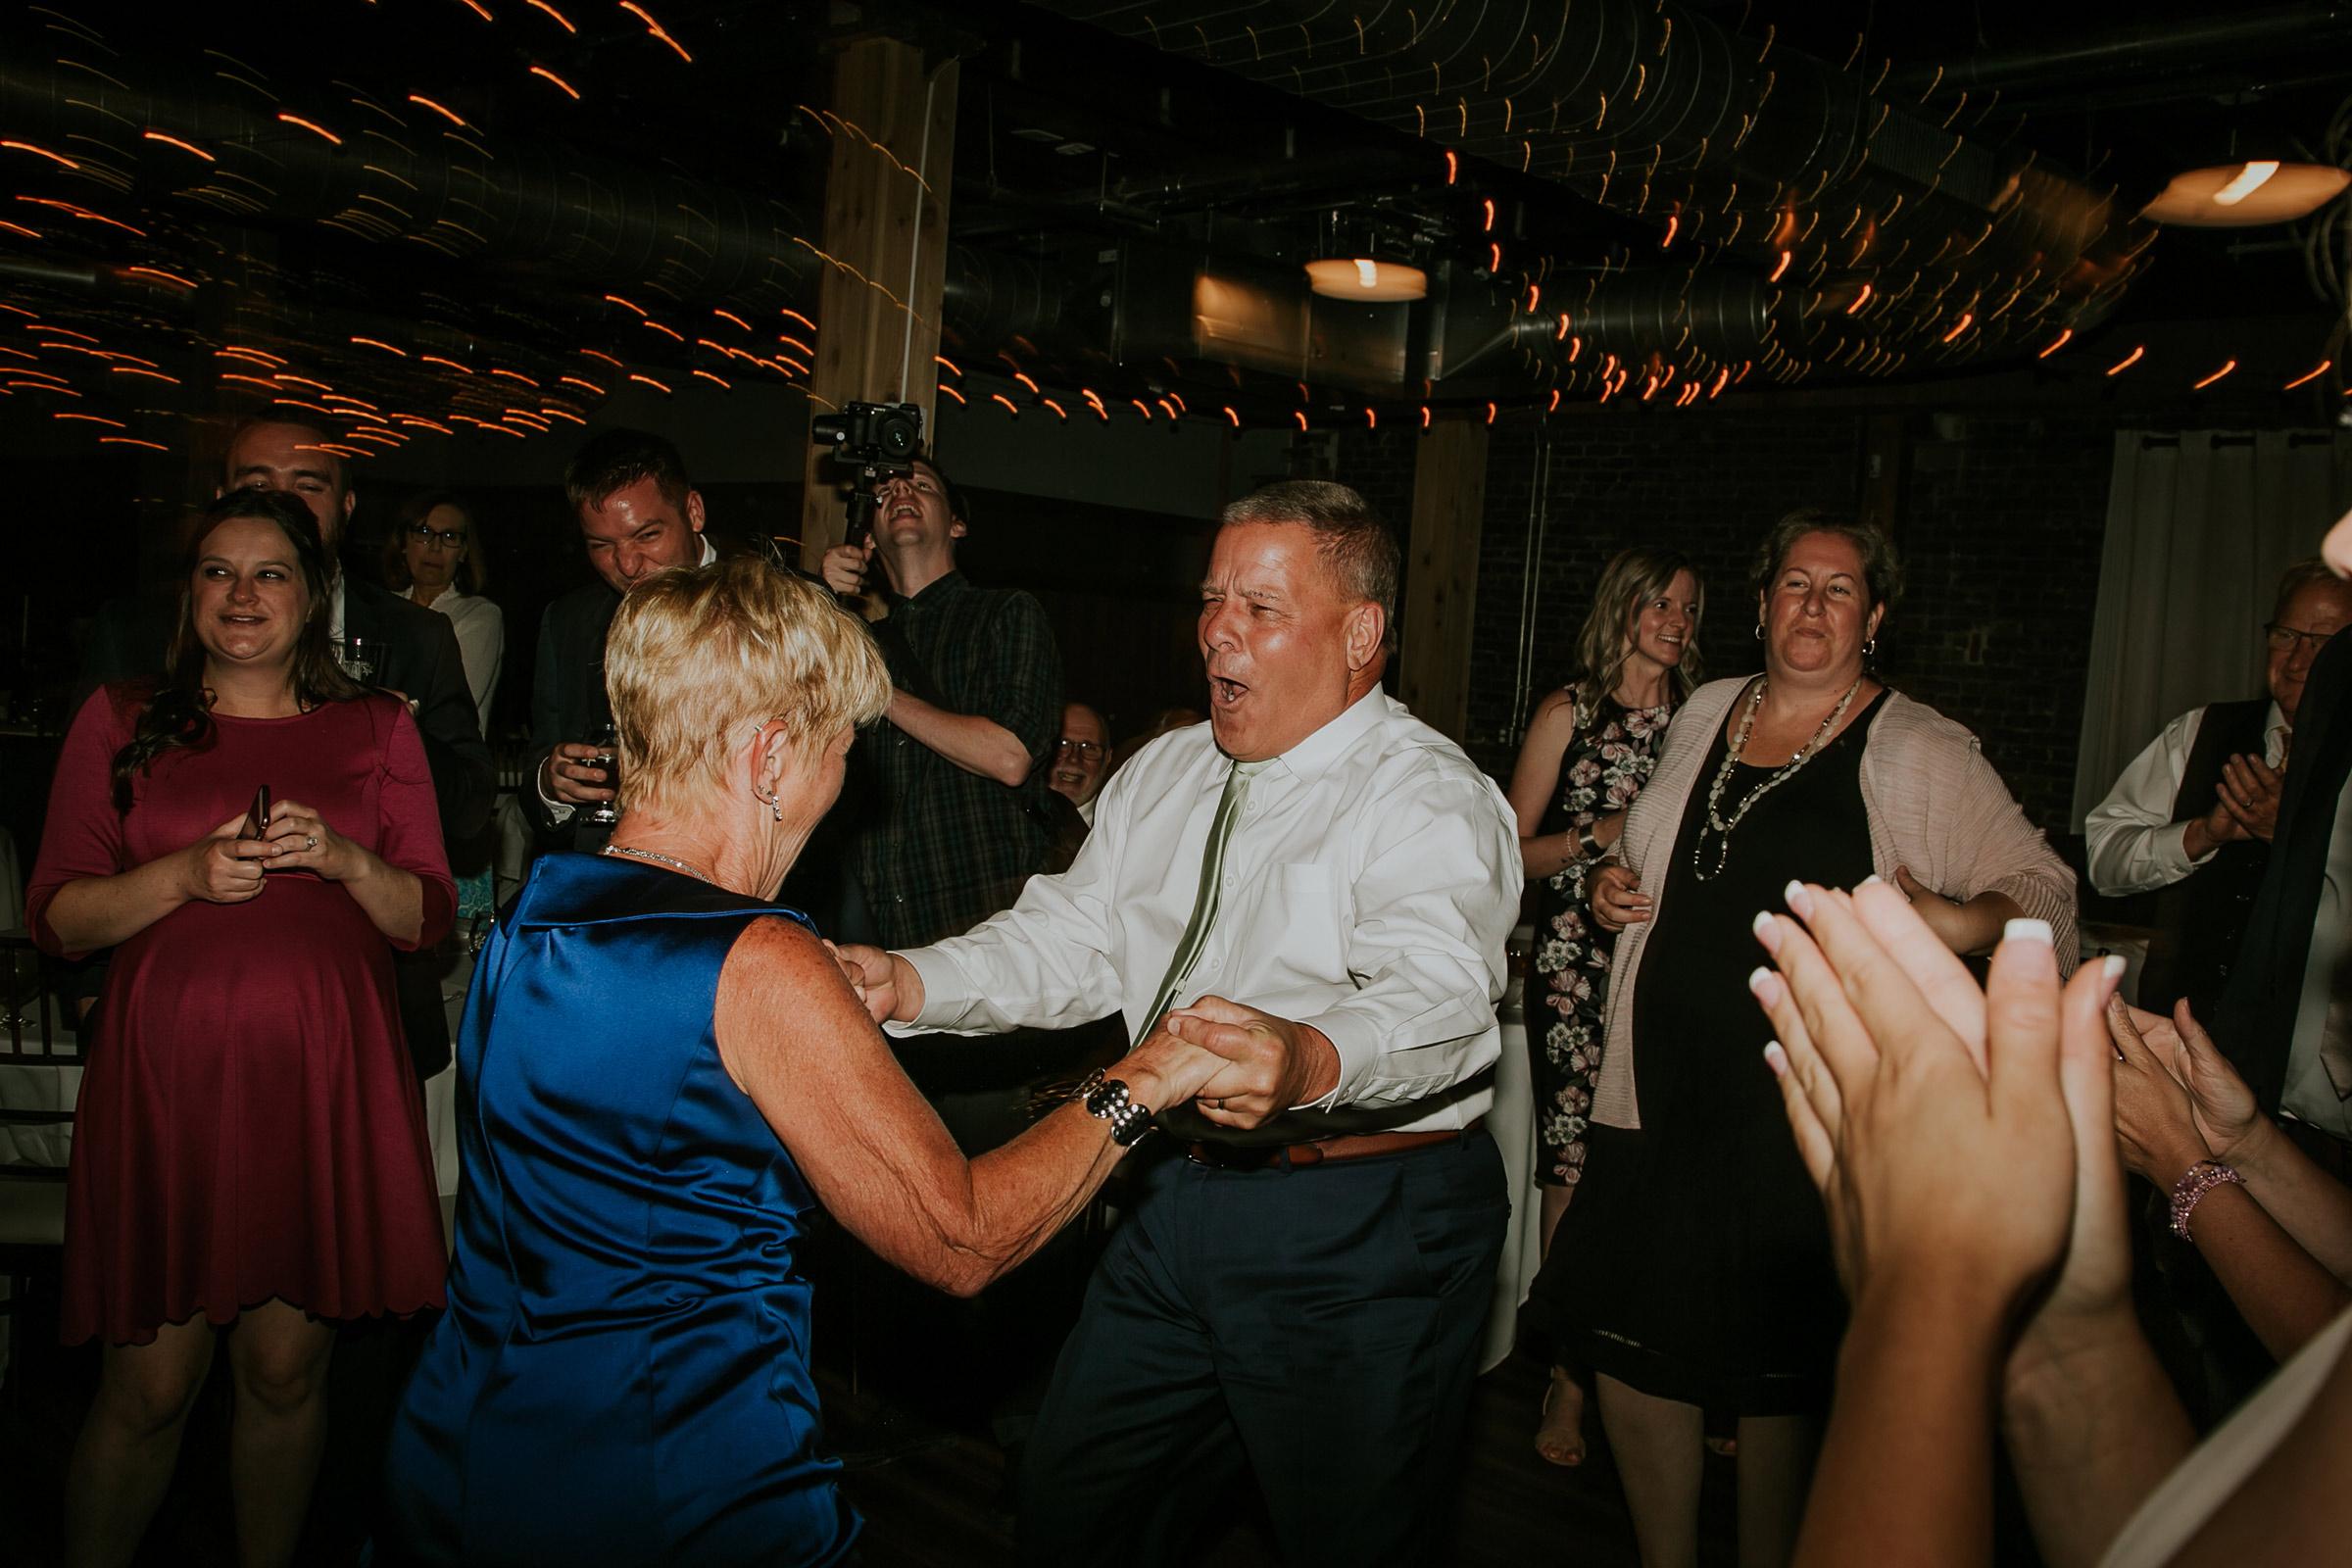 mr-mrs-hull--guests-dancing-iowa-taproom-desmoines-iowa-raelyn-ramey-photography-767.jpg